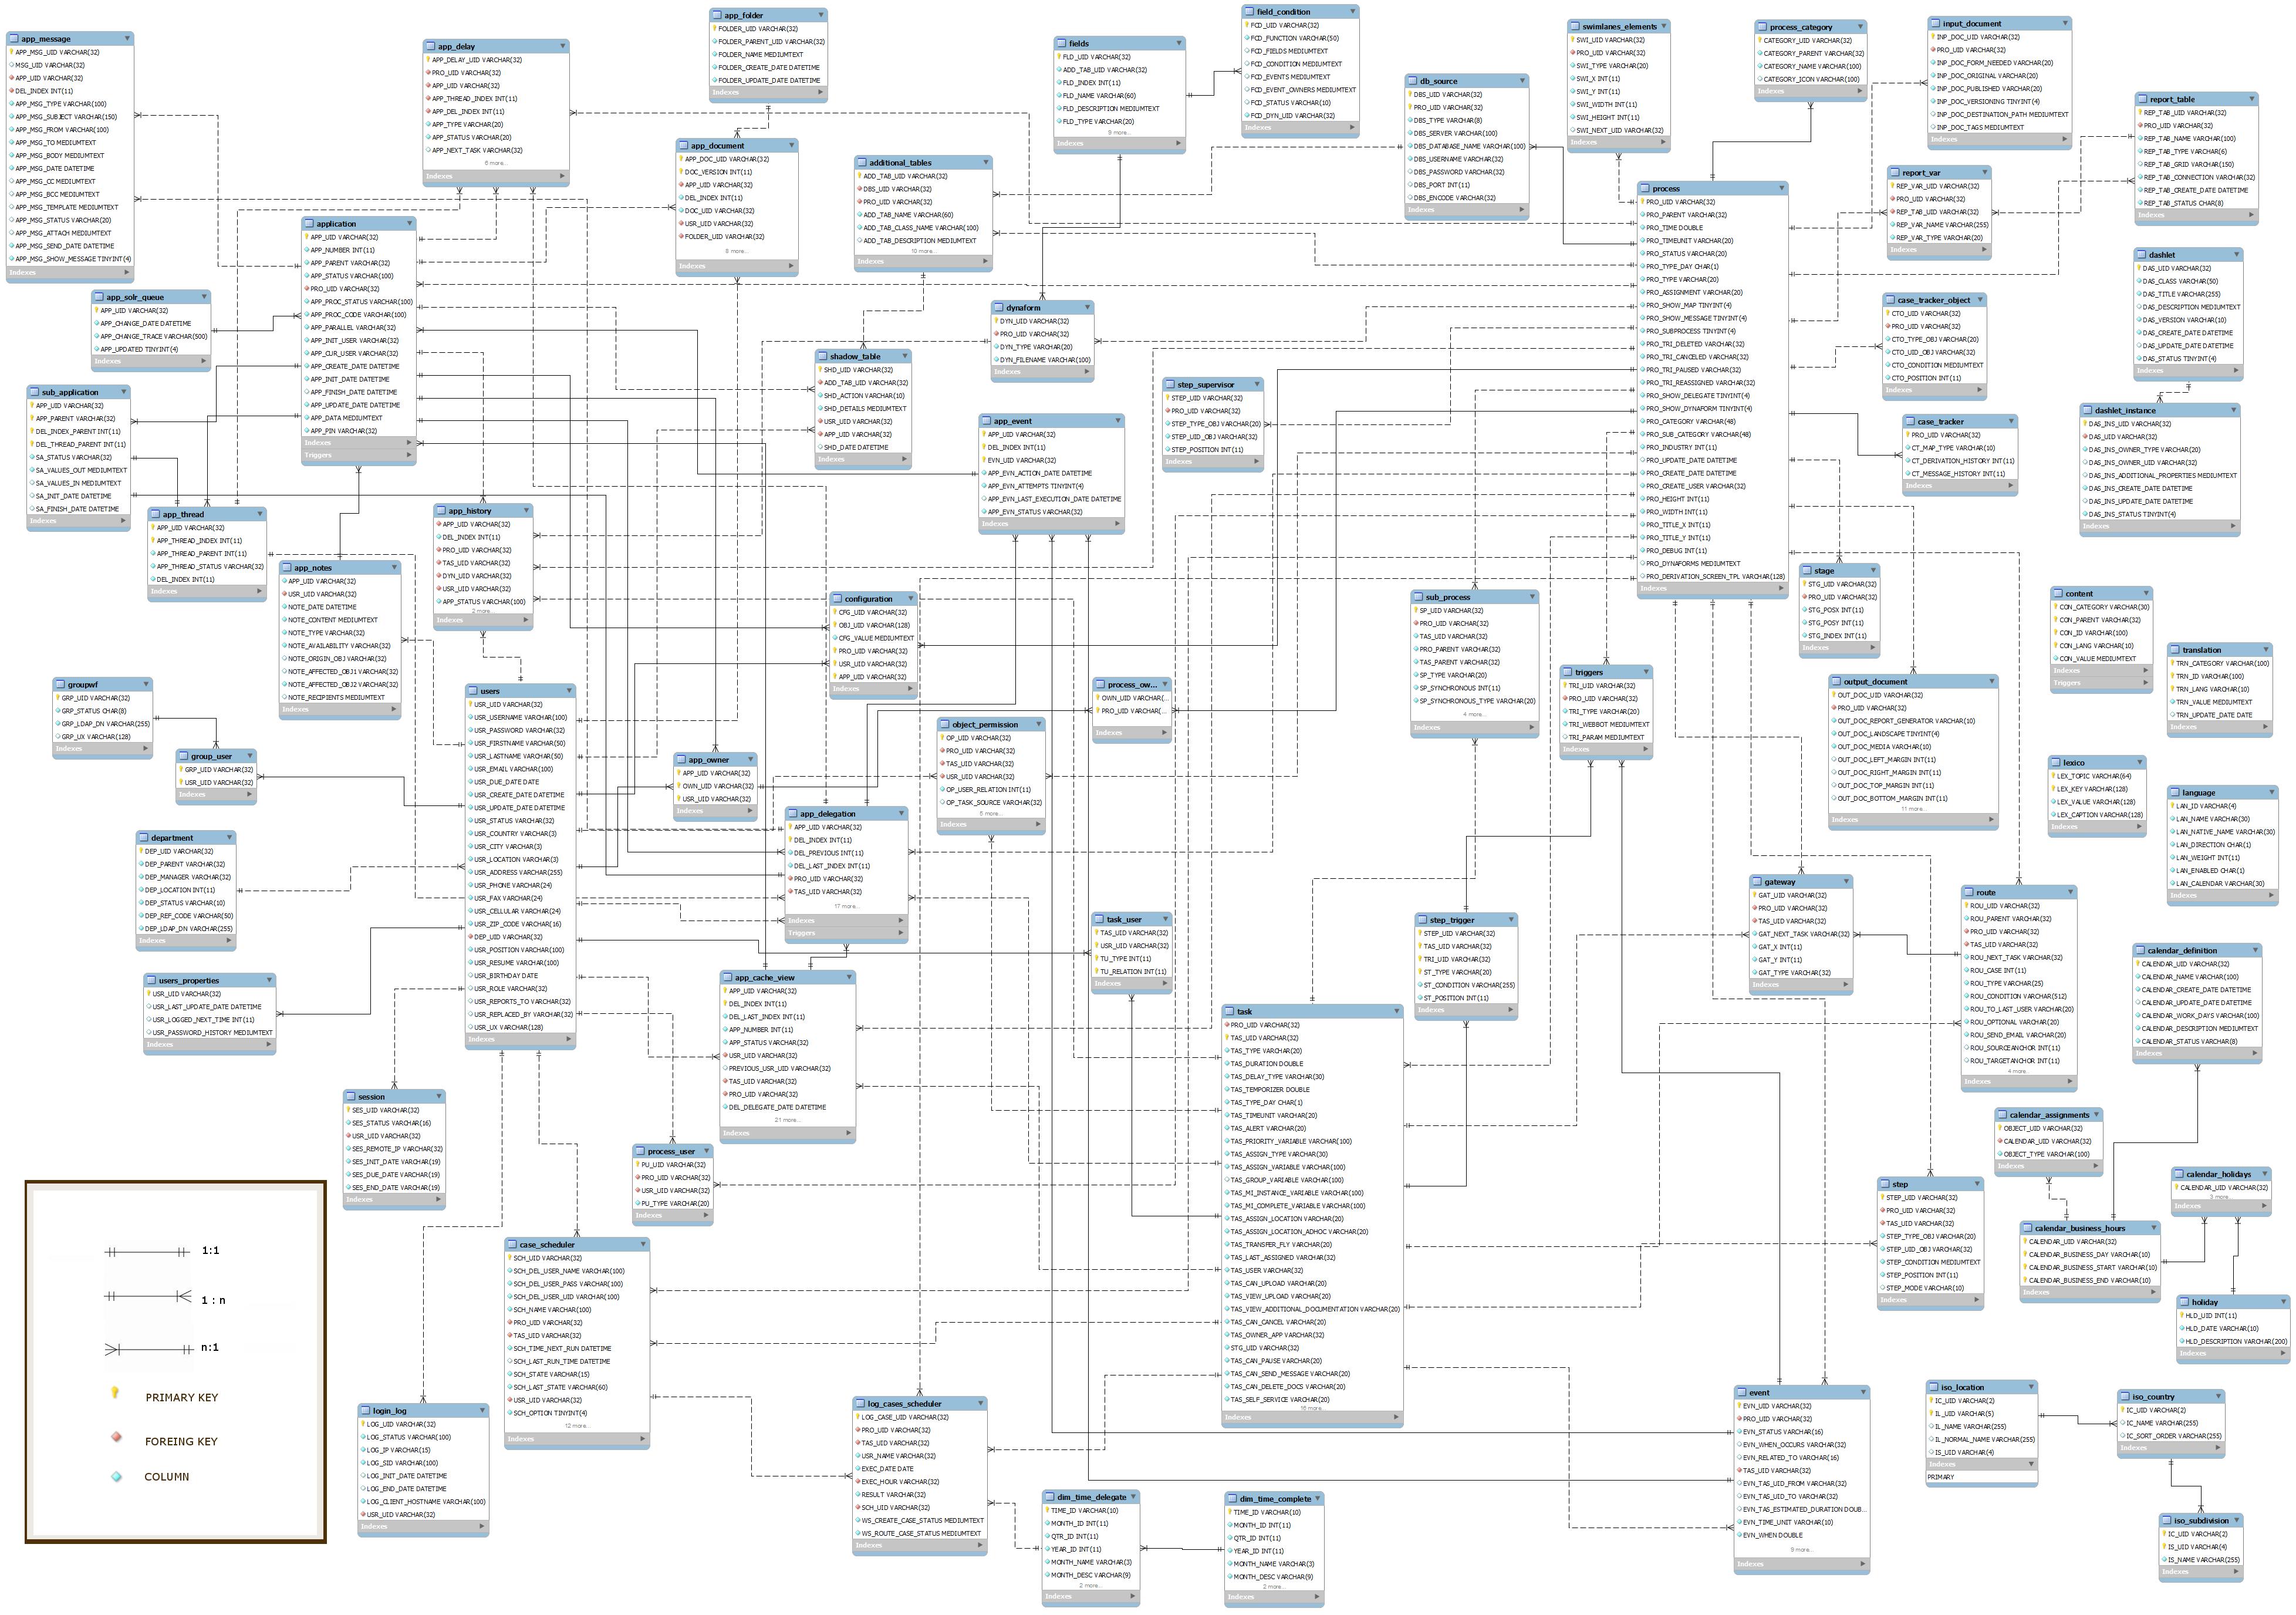 Processmaker E-R Diagram 2.0 And Later   Documentation with regard to Er Diagram For Facebook